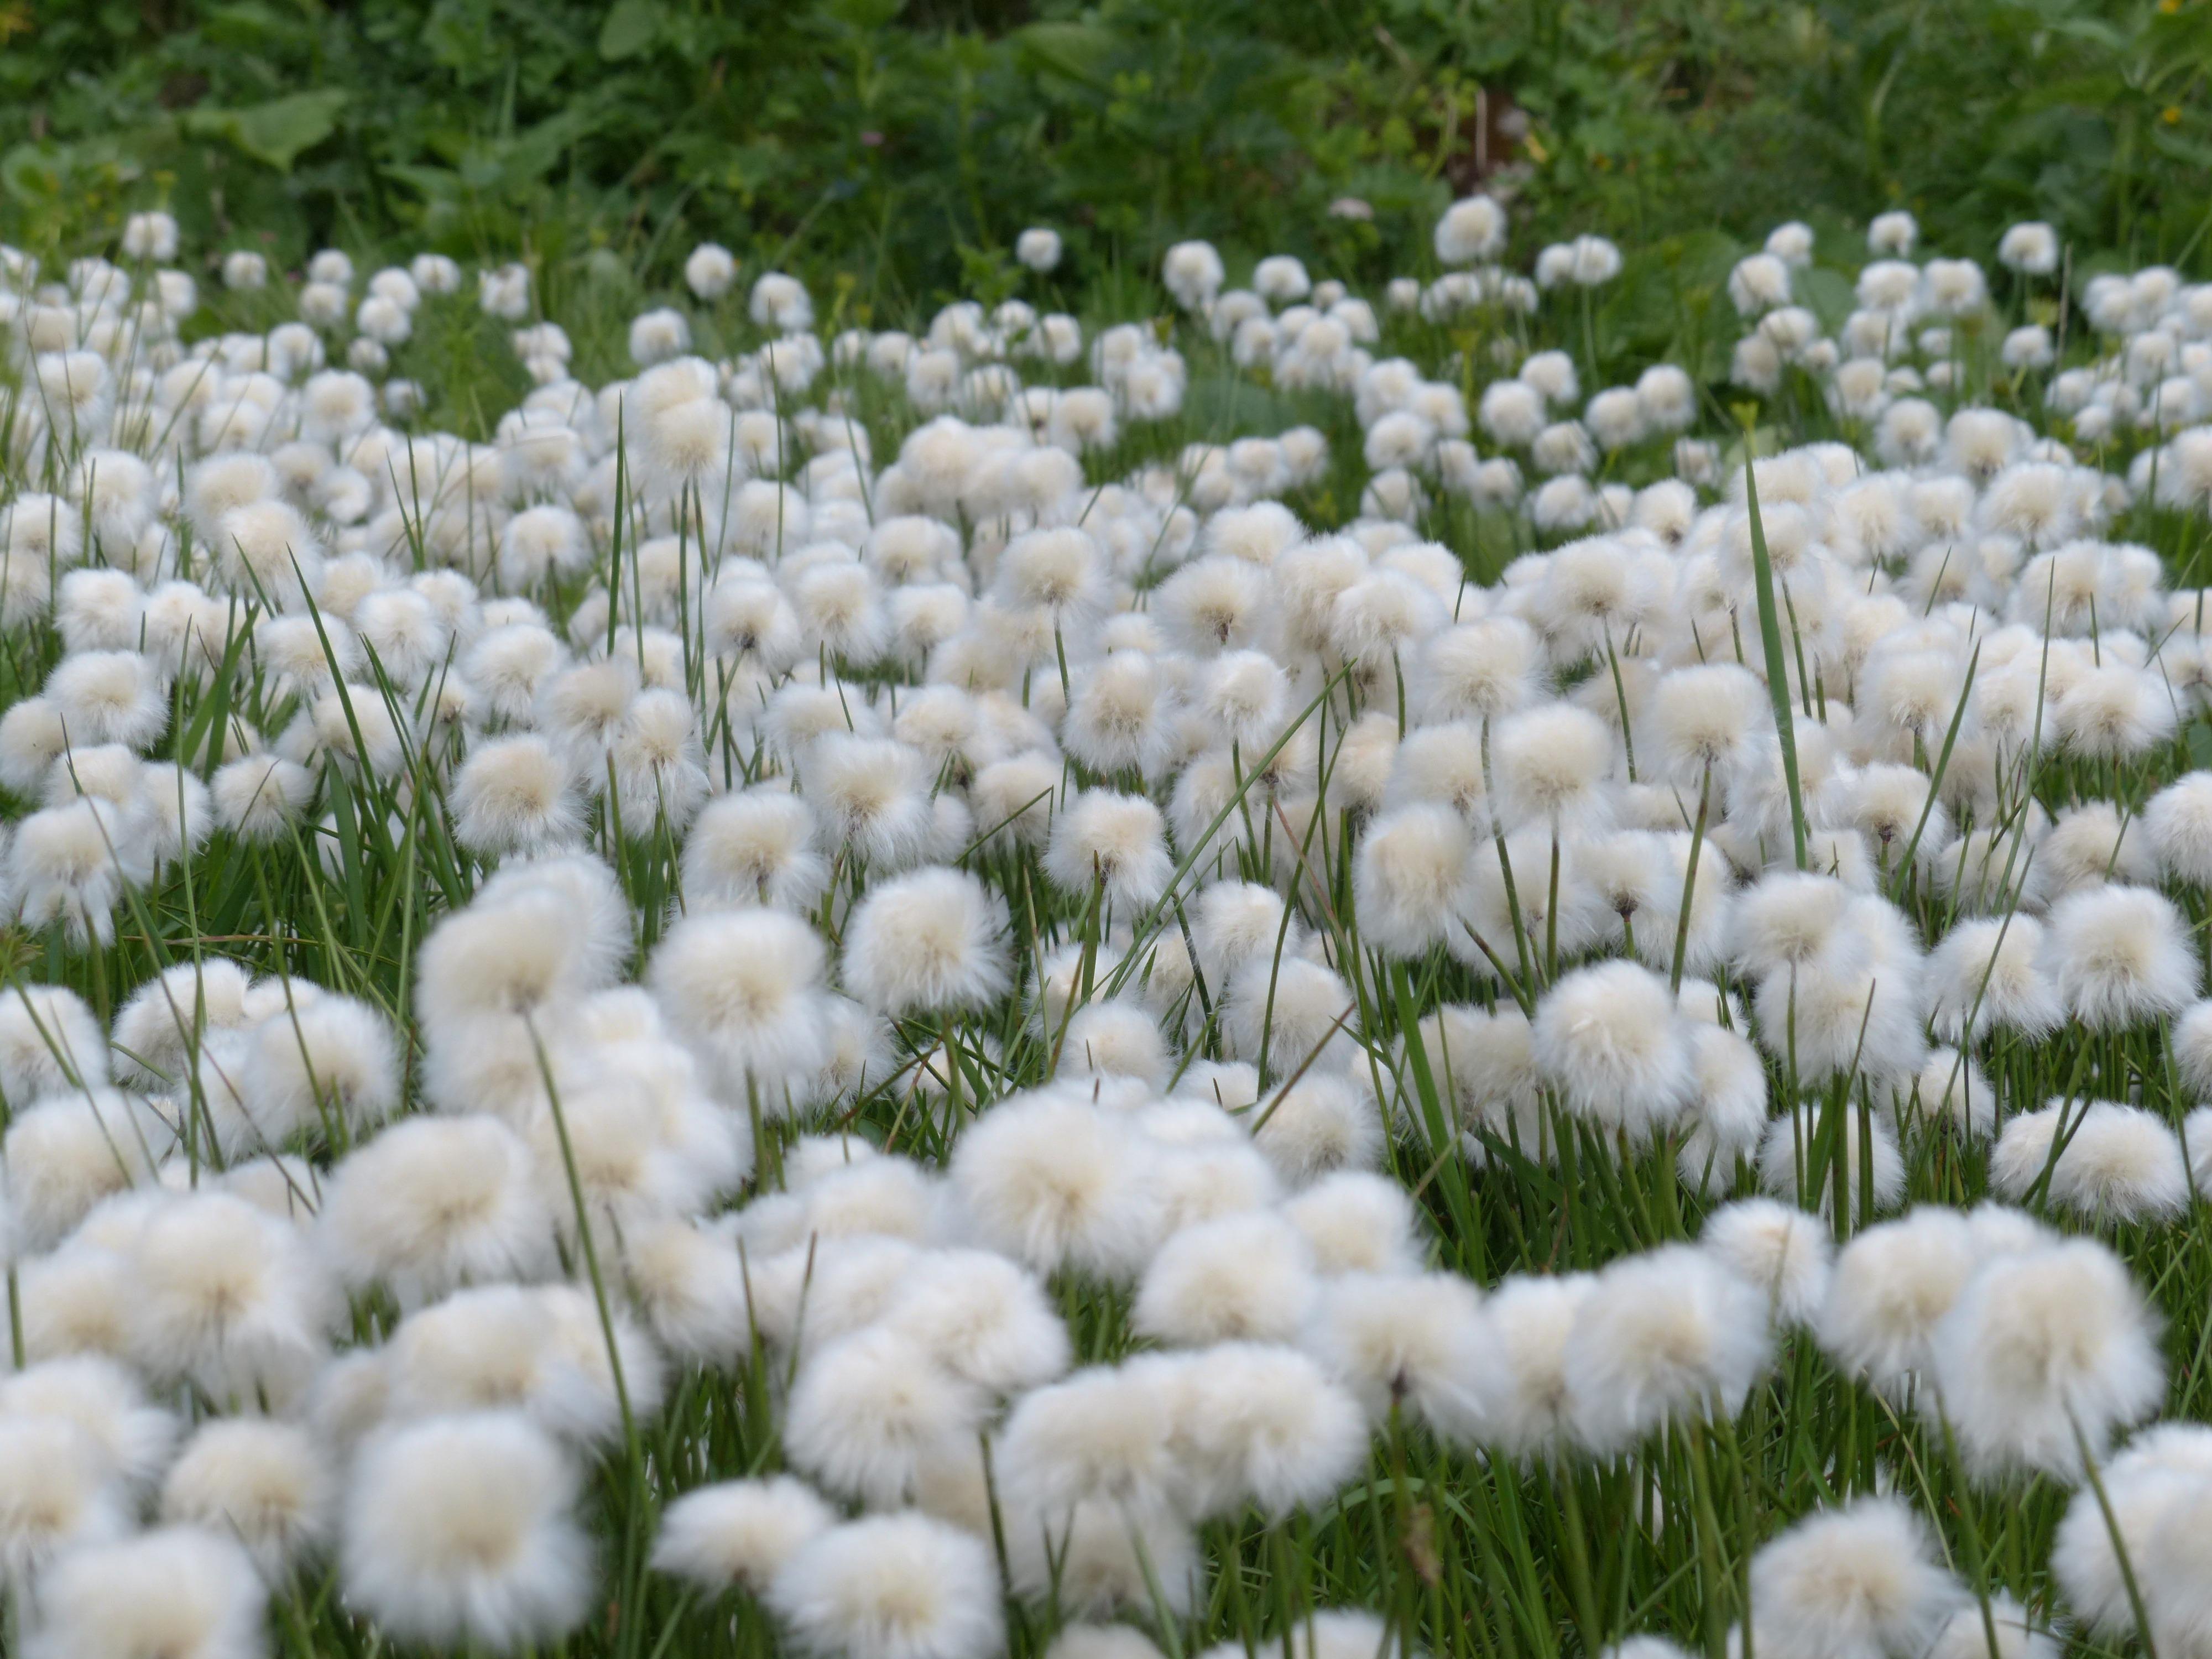 Favori Images Gratuites : herbe, blanc, champ, Prairie, fleur, vert  YH79